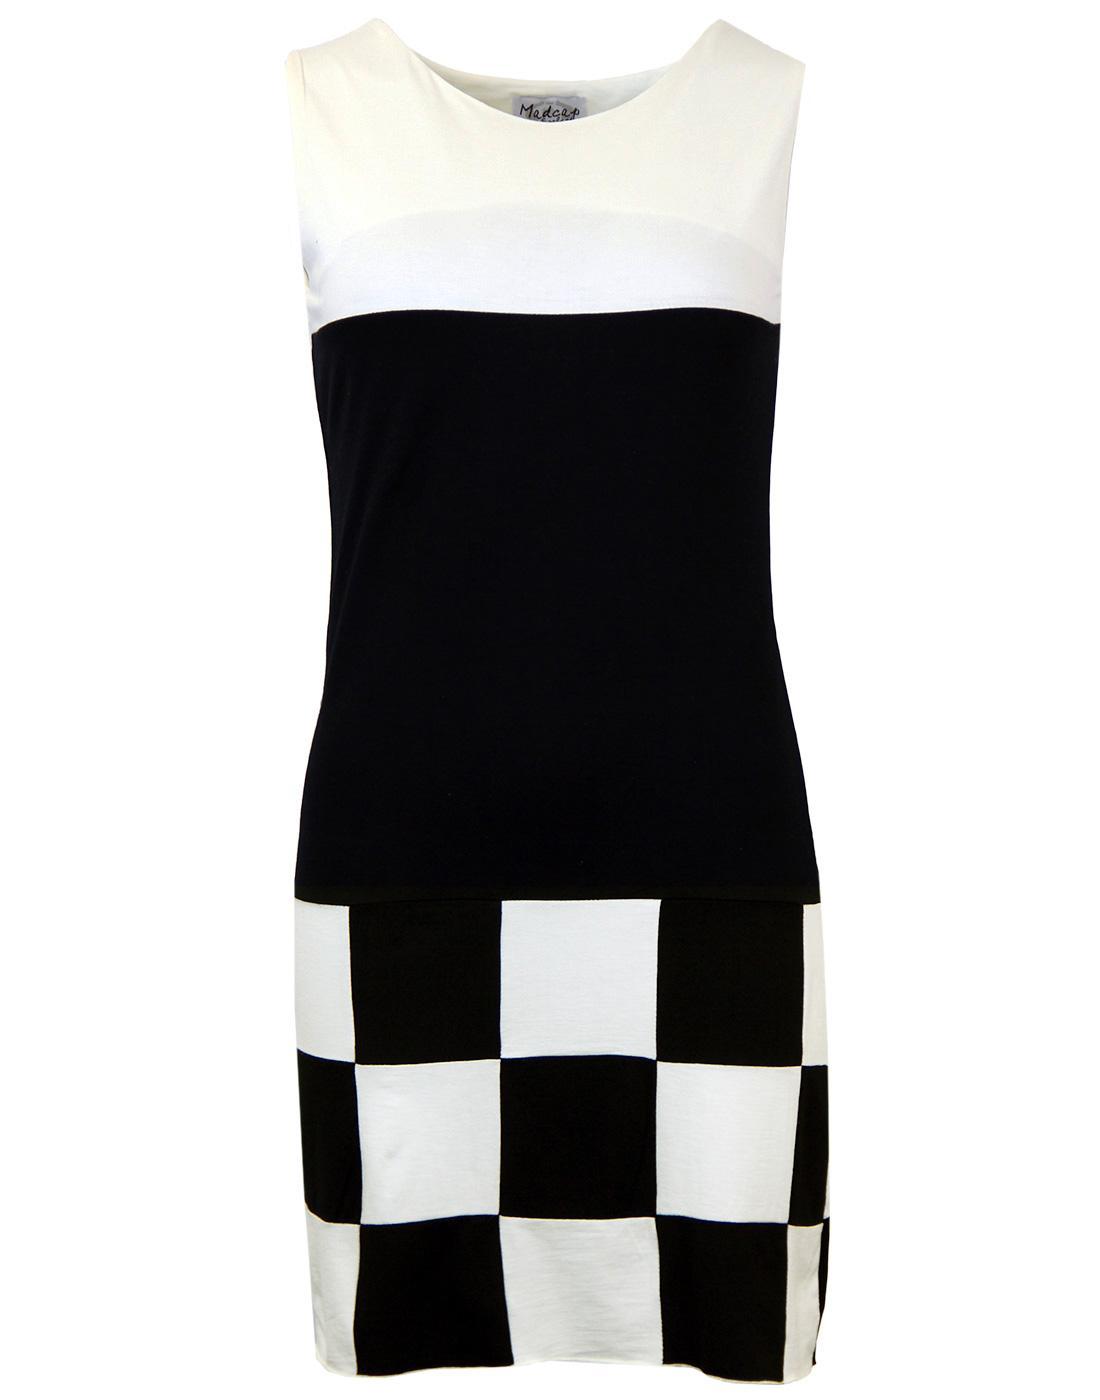 The Cavern Dress MADCAP ENGLAND Mod Dress